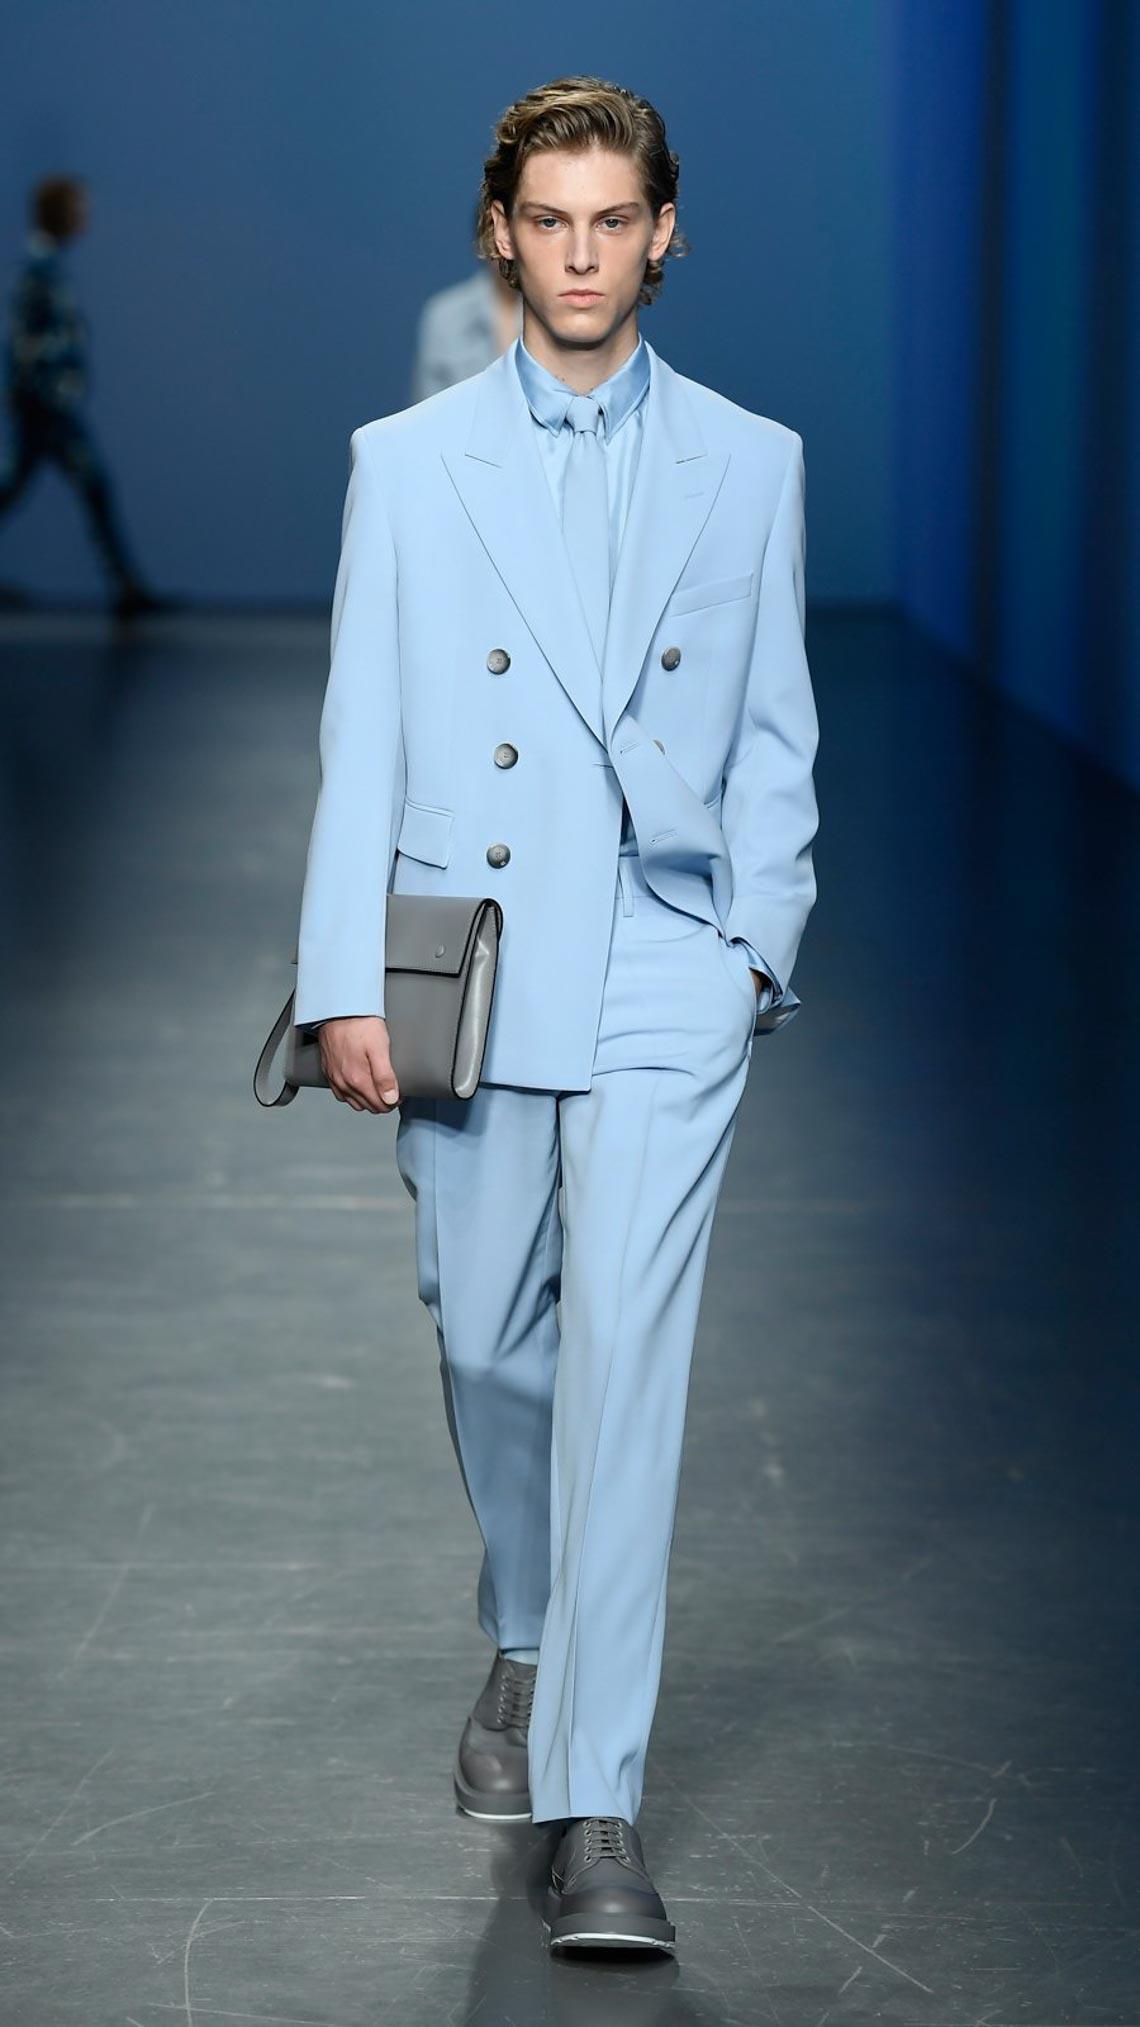 BST BOSS Individuals Xuân-Hè 2020 tại Milan Fashion Week - 11